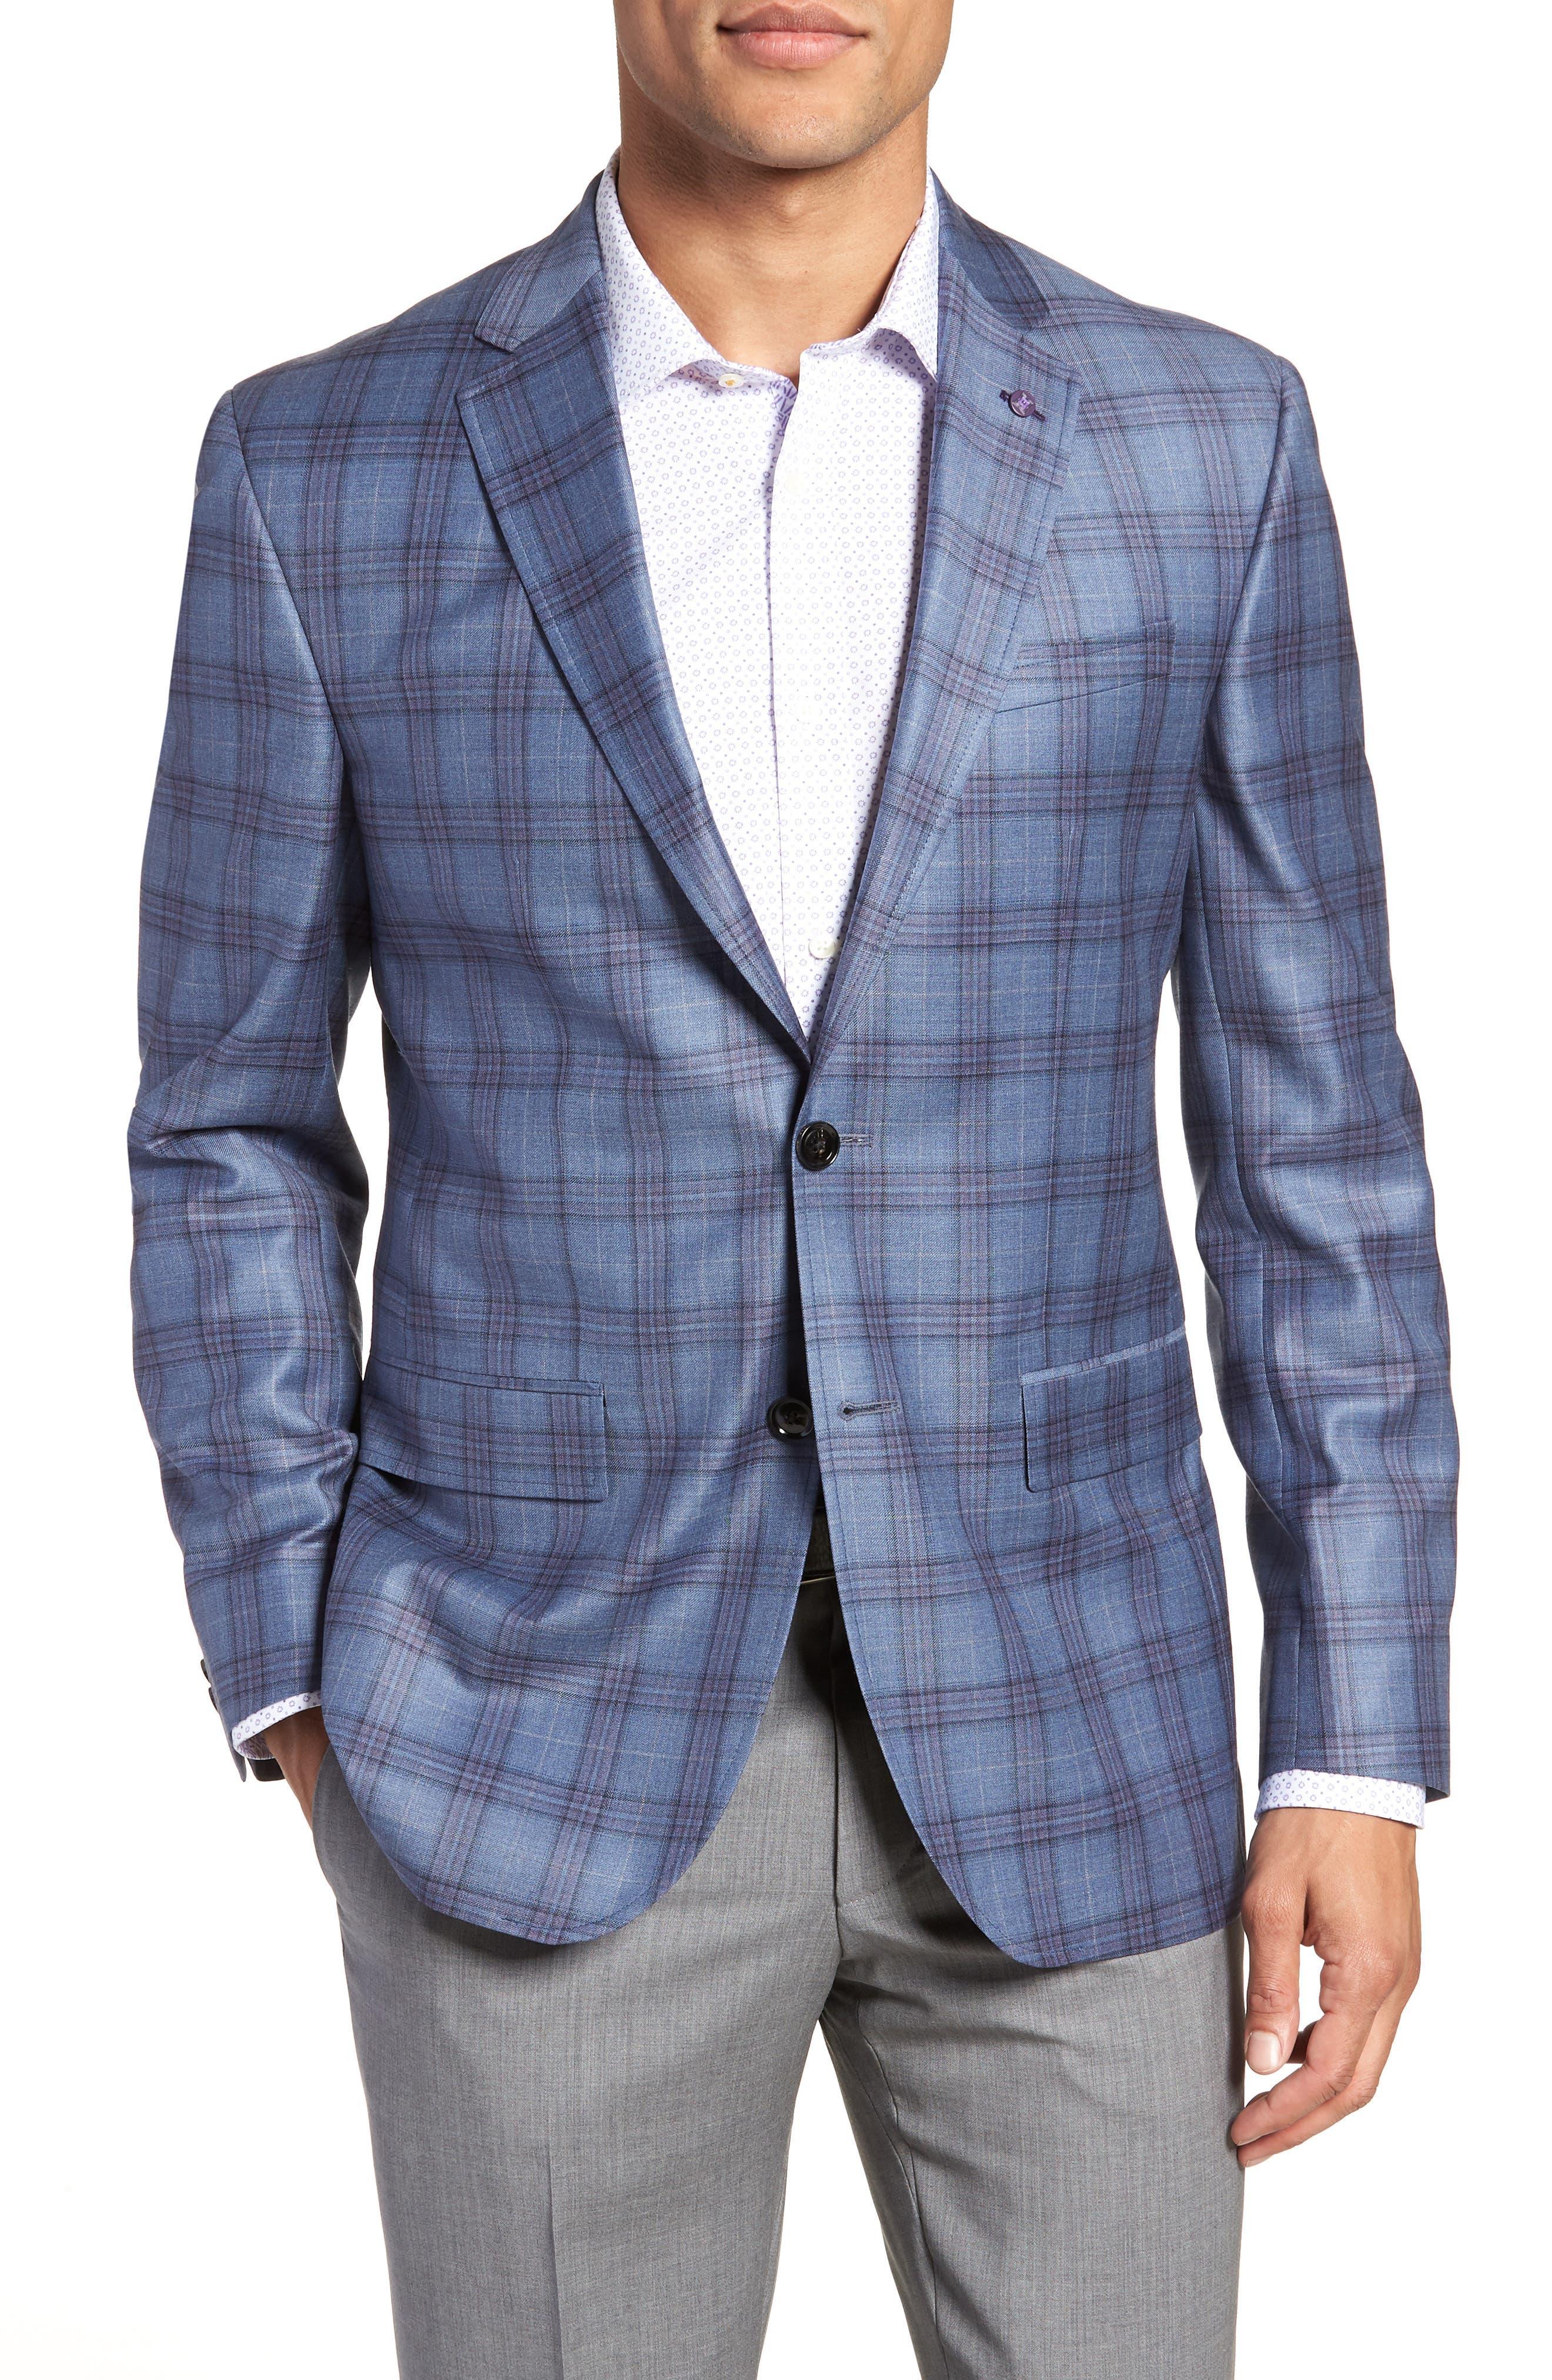 Jay Trim Fit Plaid Wool Sport Coat,                             Main thumbnail 1, color,                             Blue